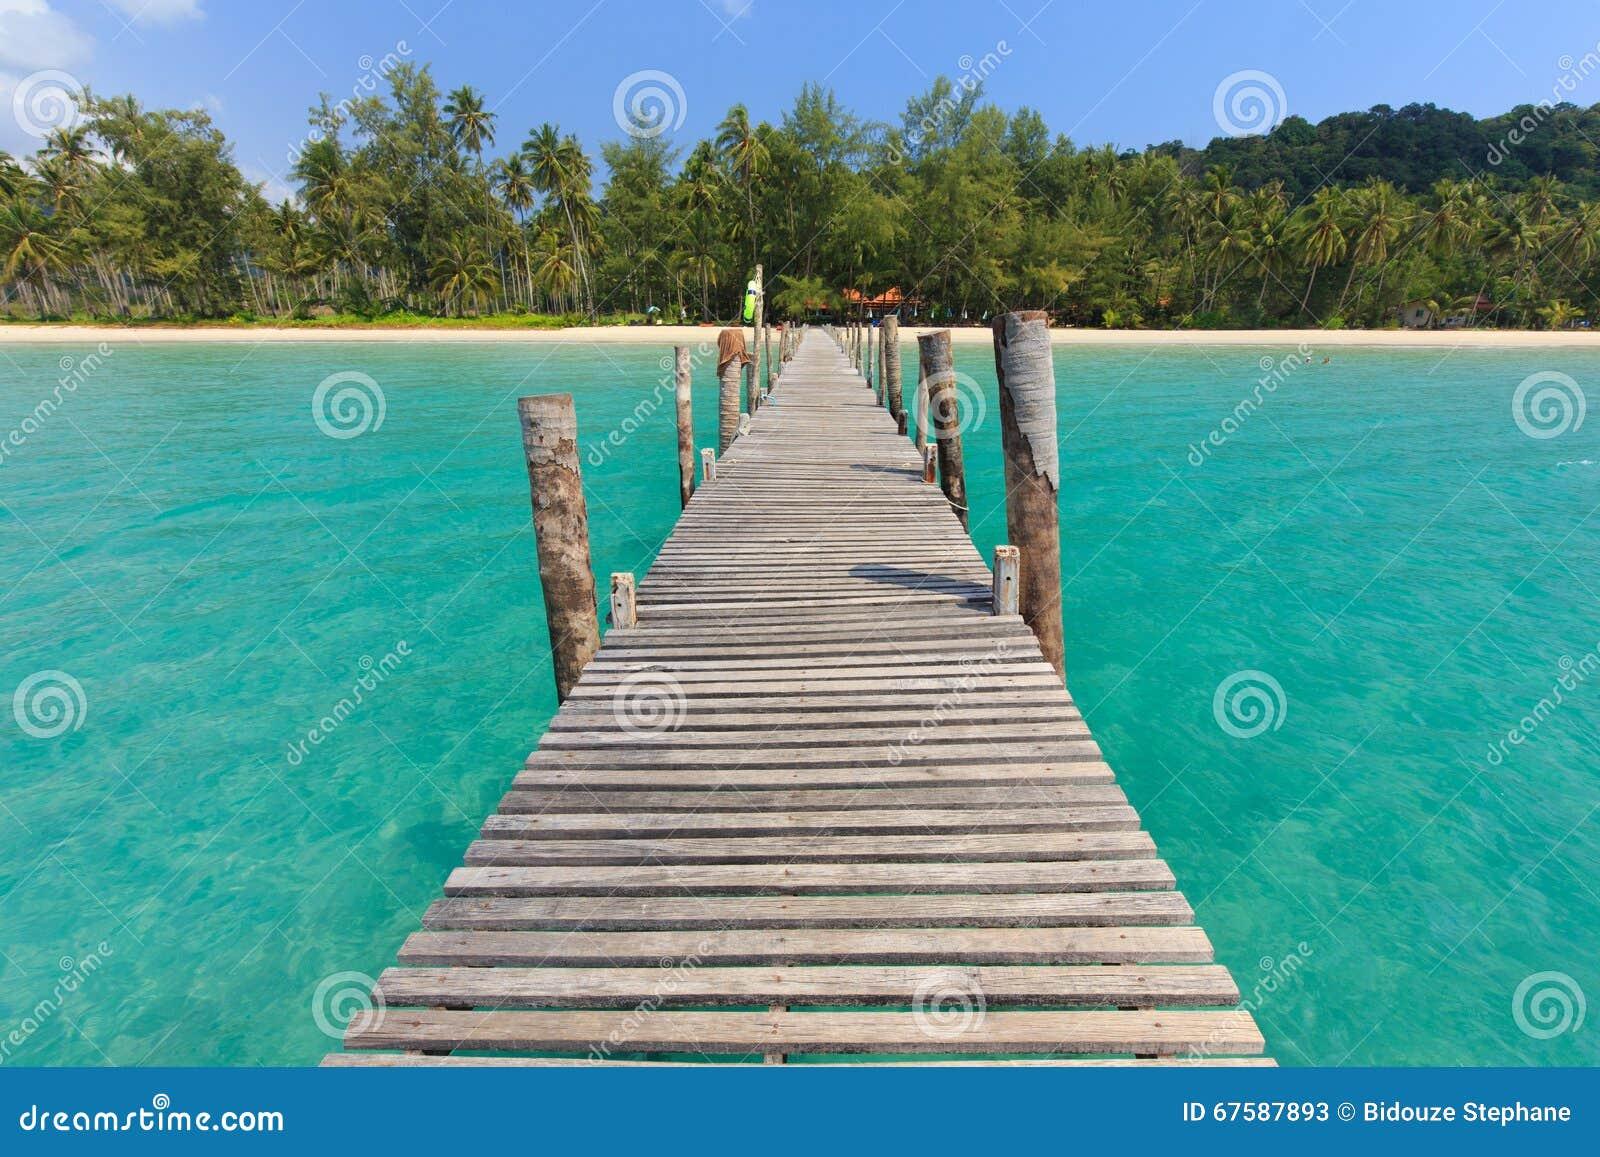 Bien-aimé Ponton En Bois En Mer Tropicale Photo stock - Image: 67587893 XF77